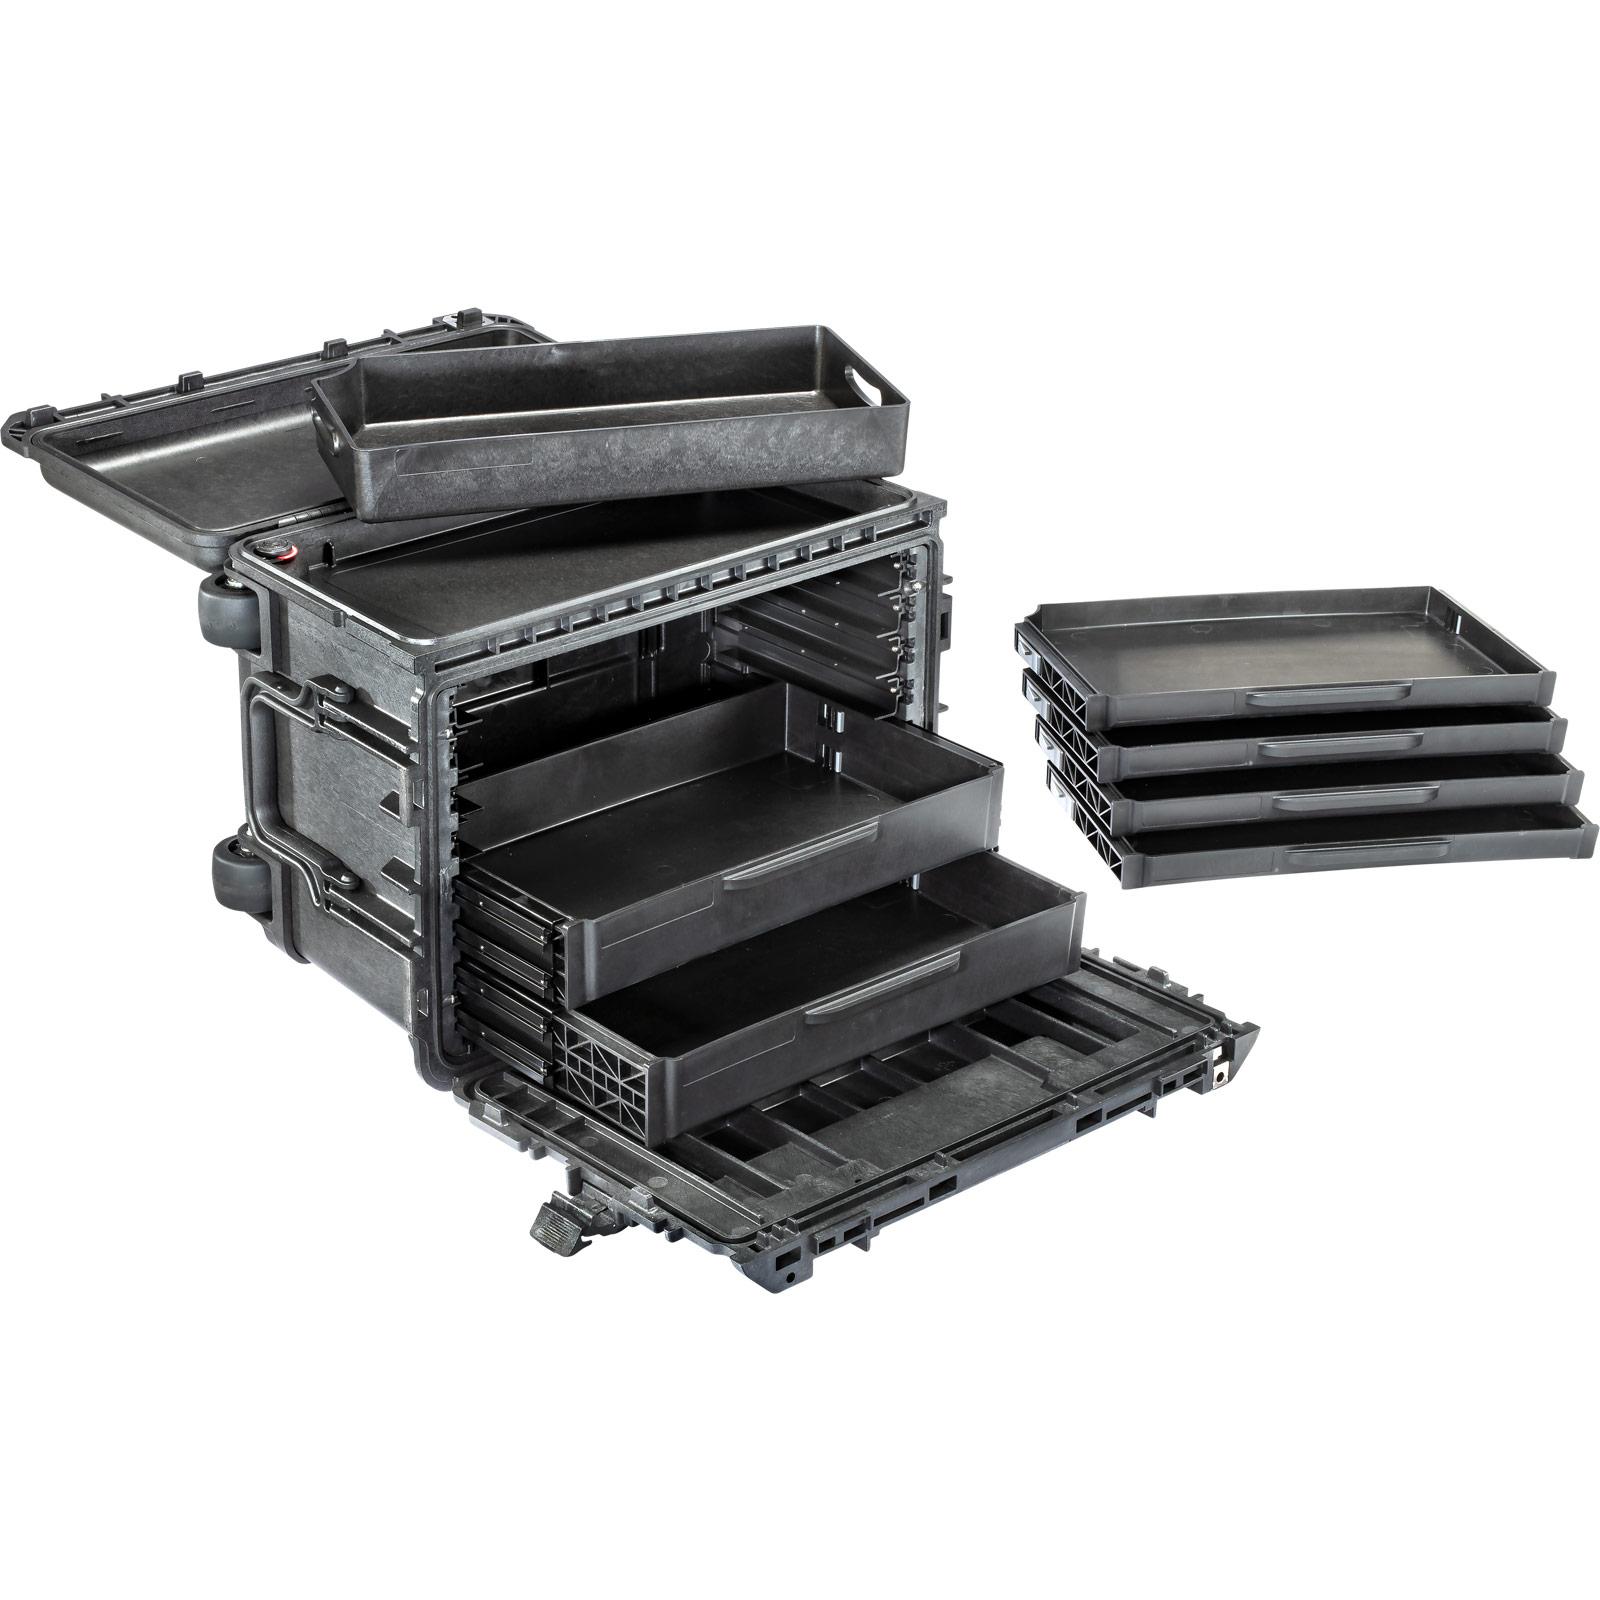 pelican 0450 heavy duty tool chest